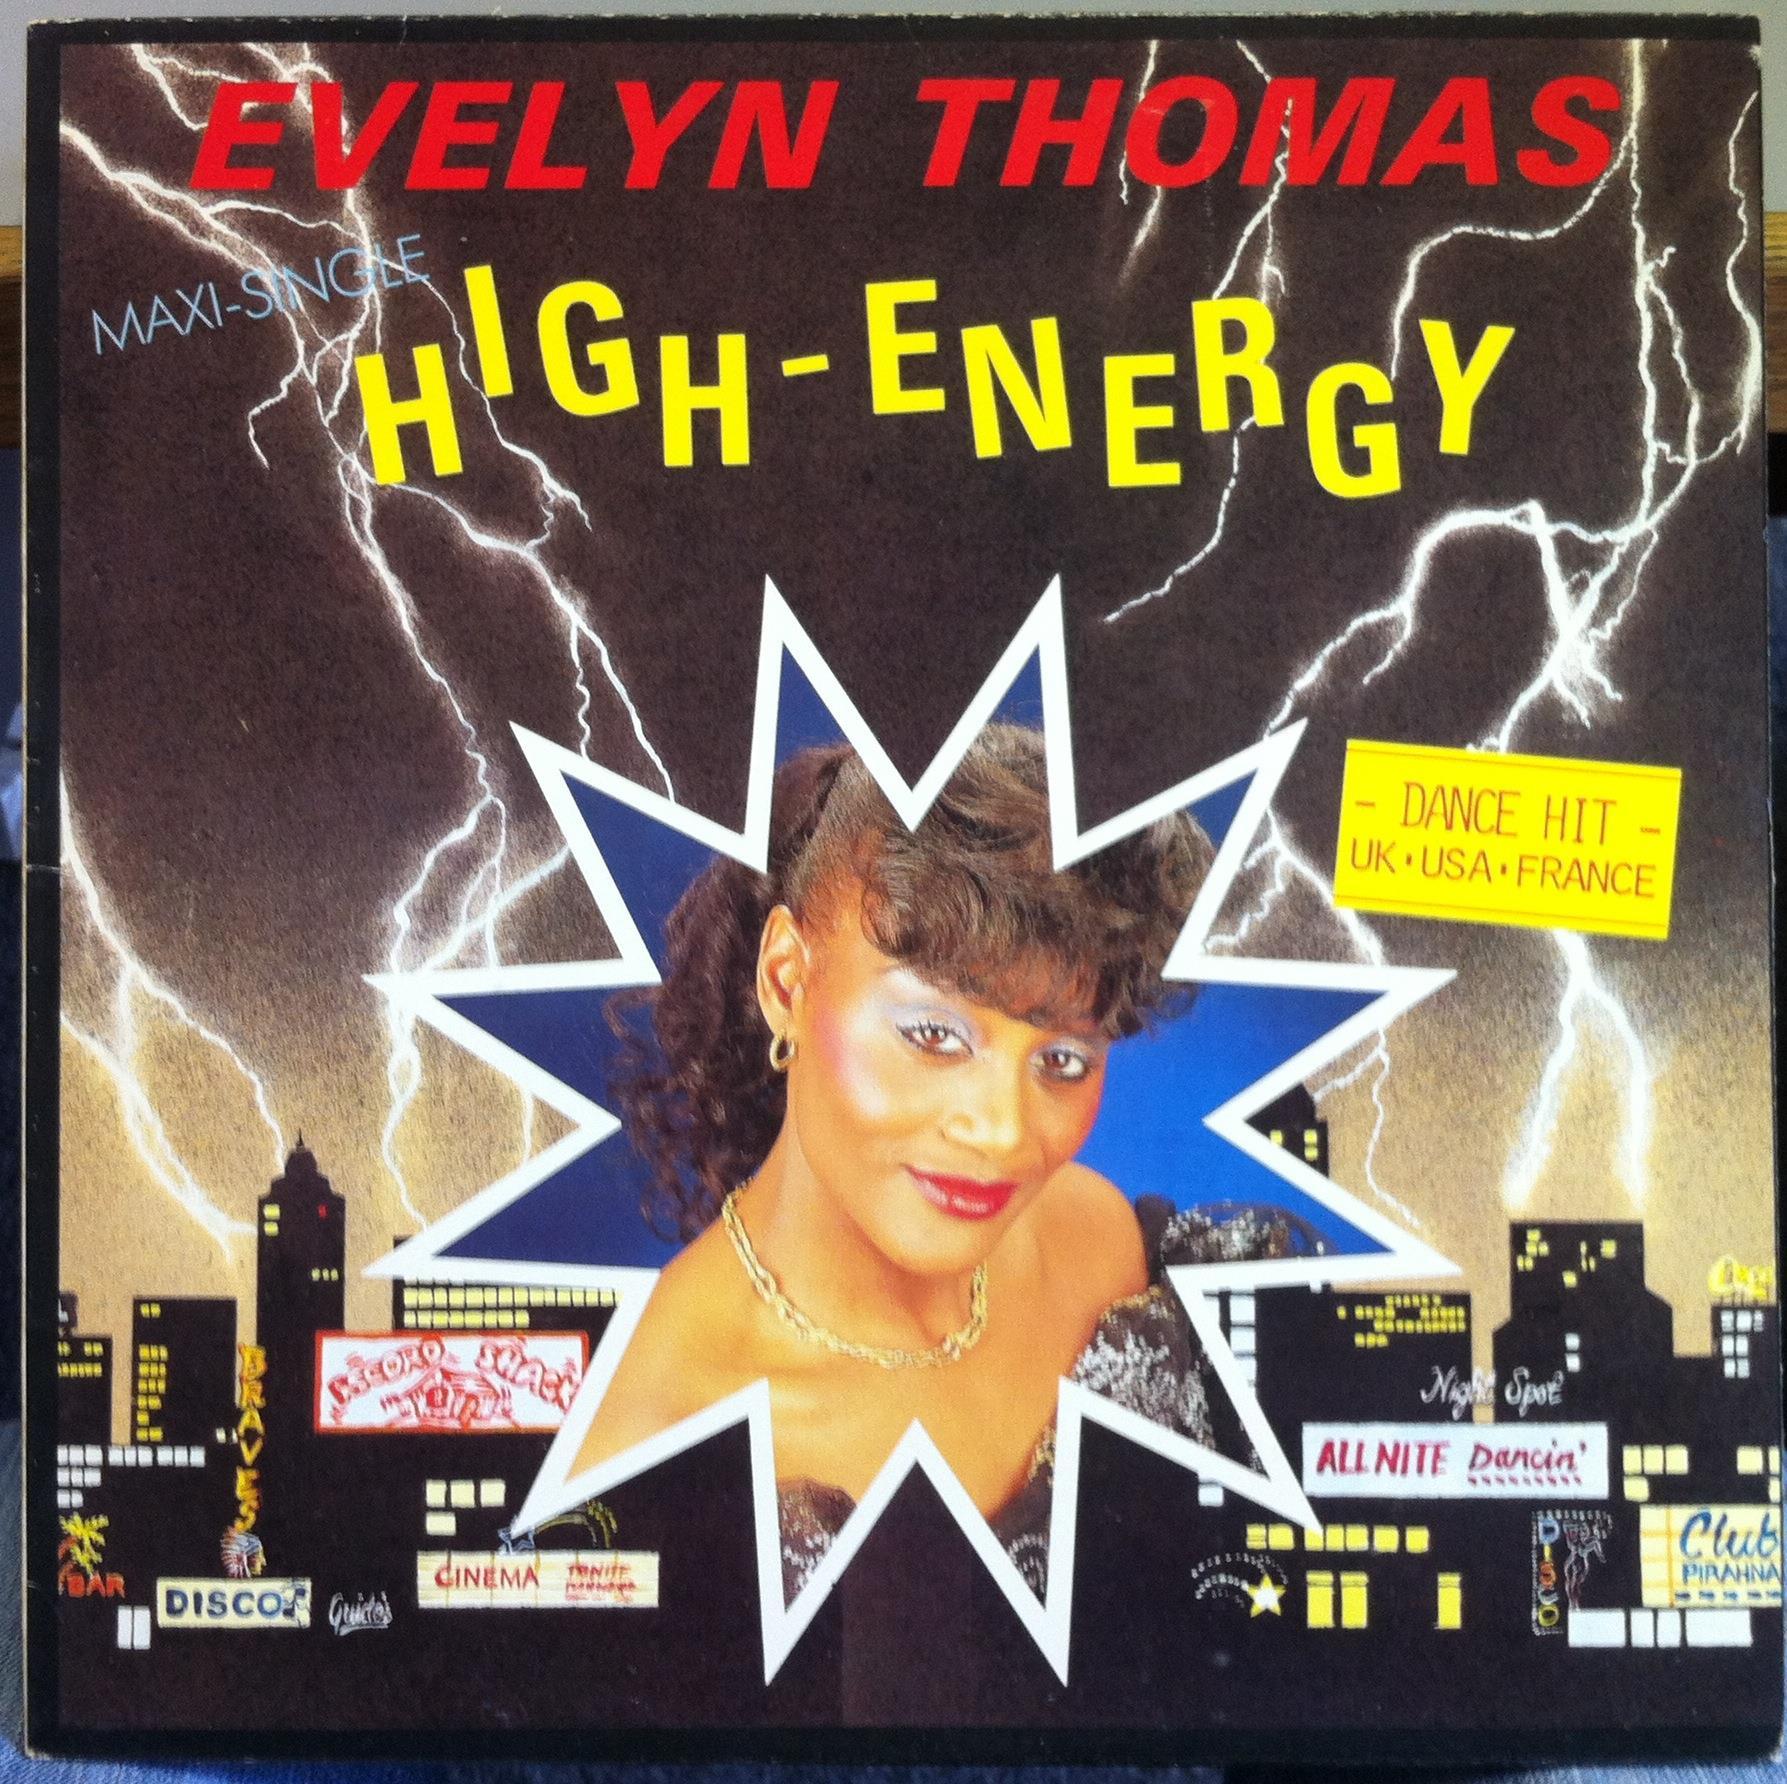 EVELYN THOMAS - High Energy - 12 inch 45 rpm